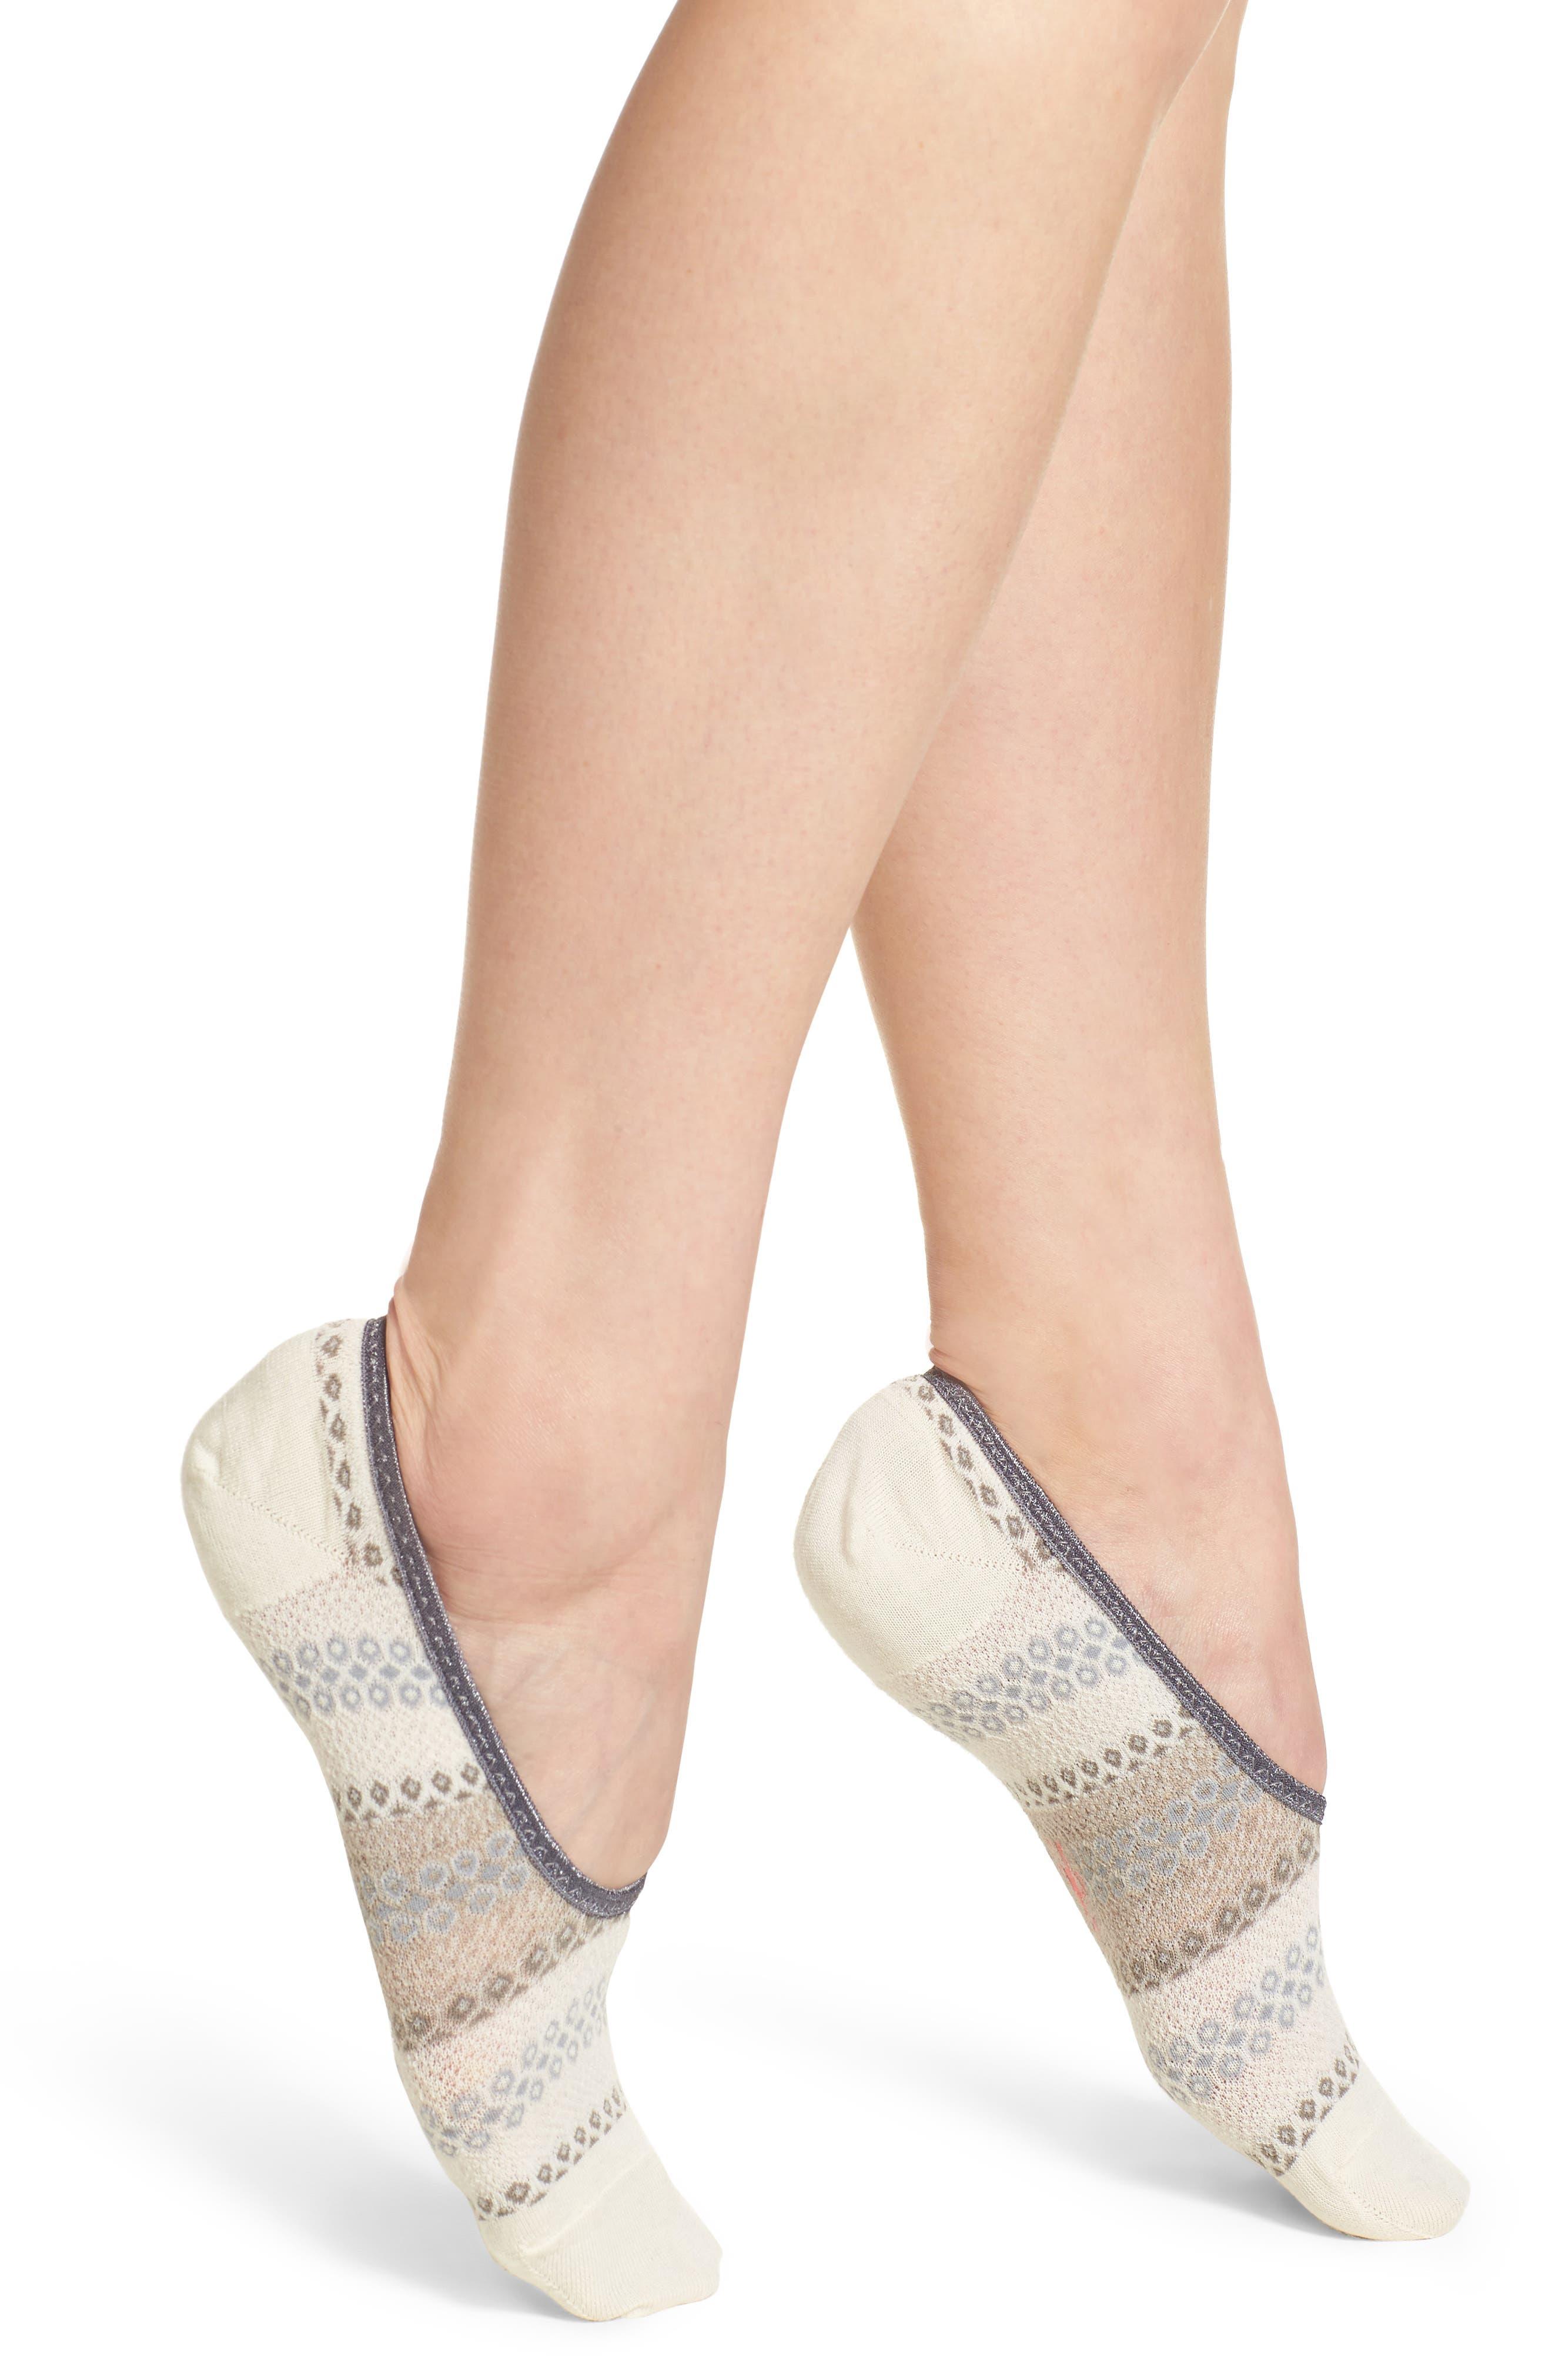 Beyond The Hive Hide & Seek No-Show Socks,                         Main,                         color, Natural